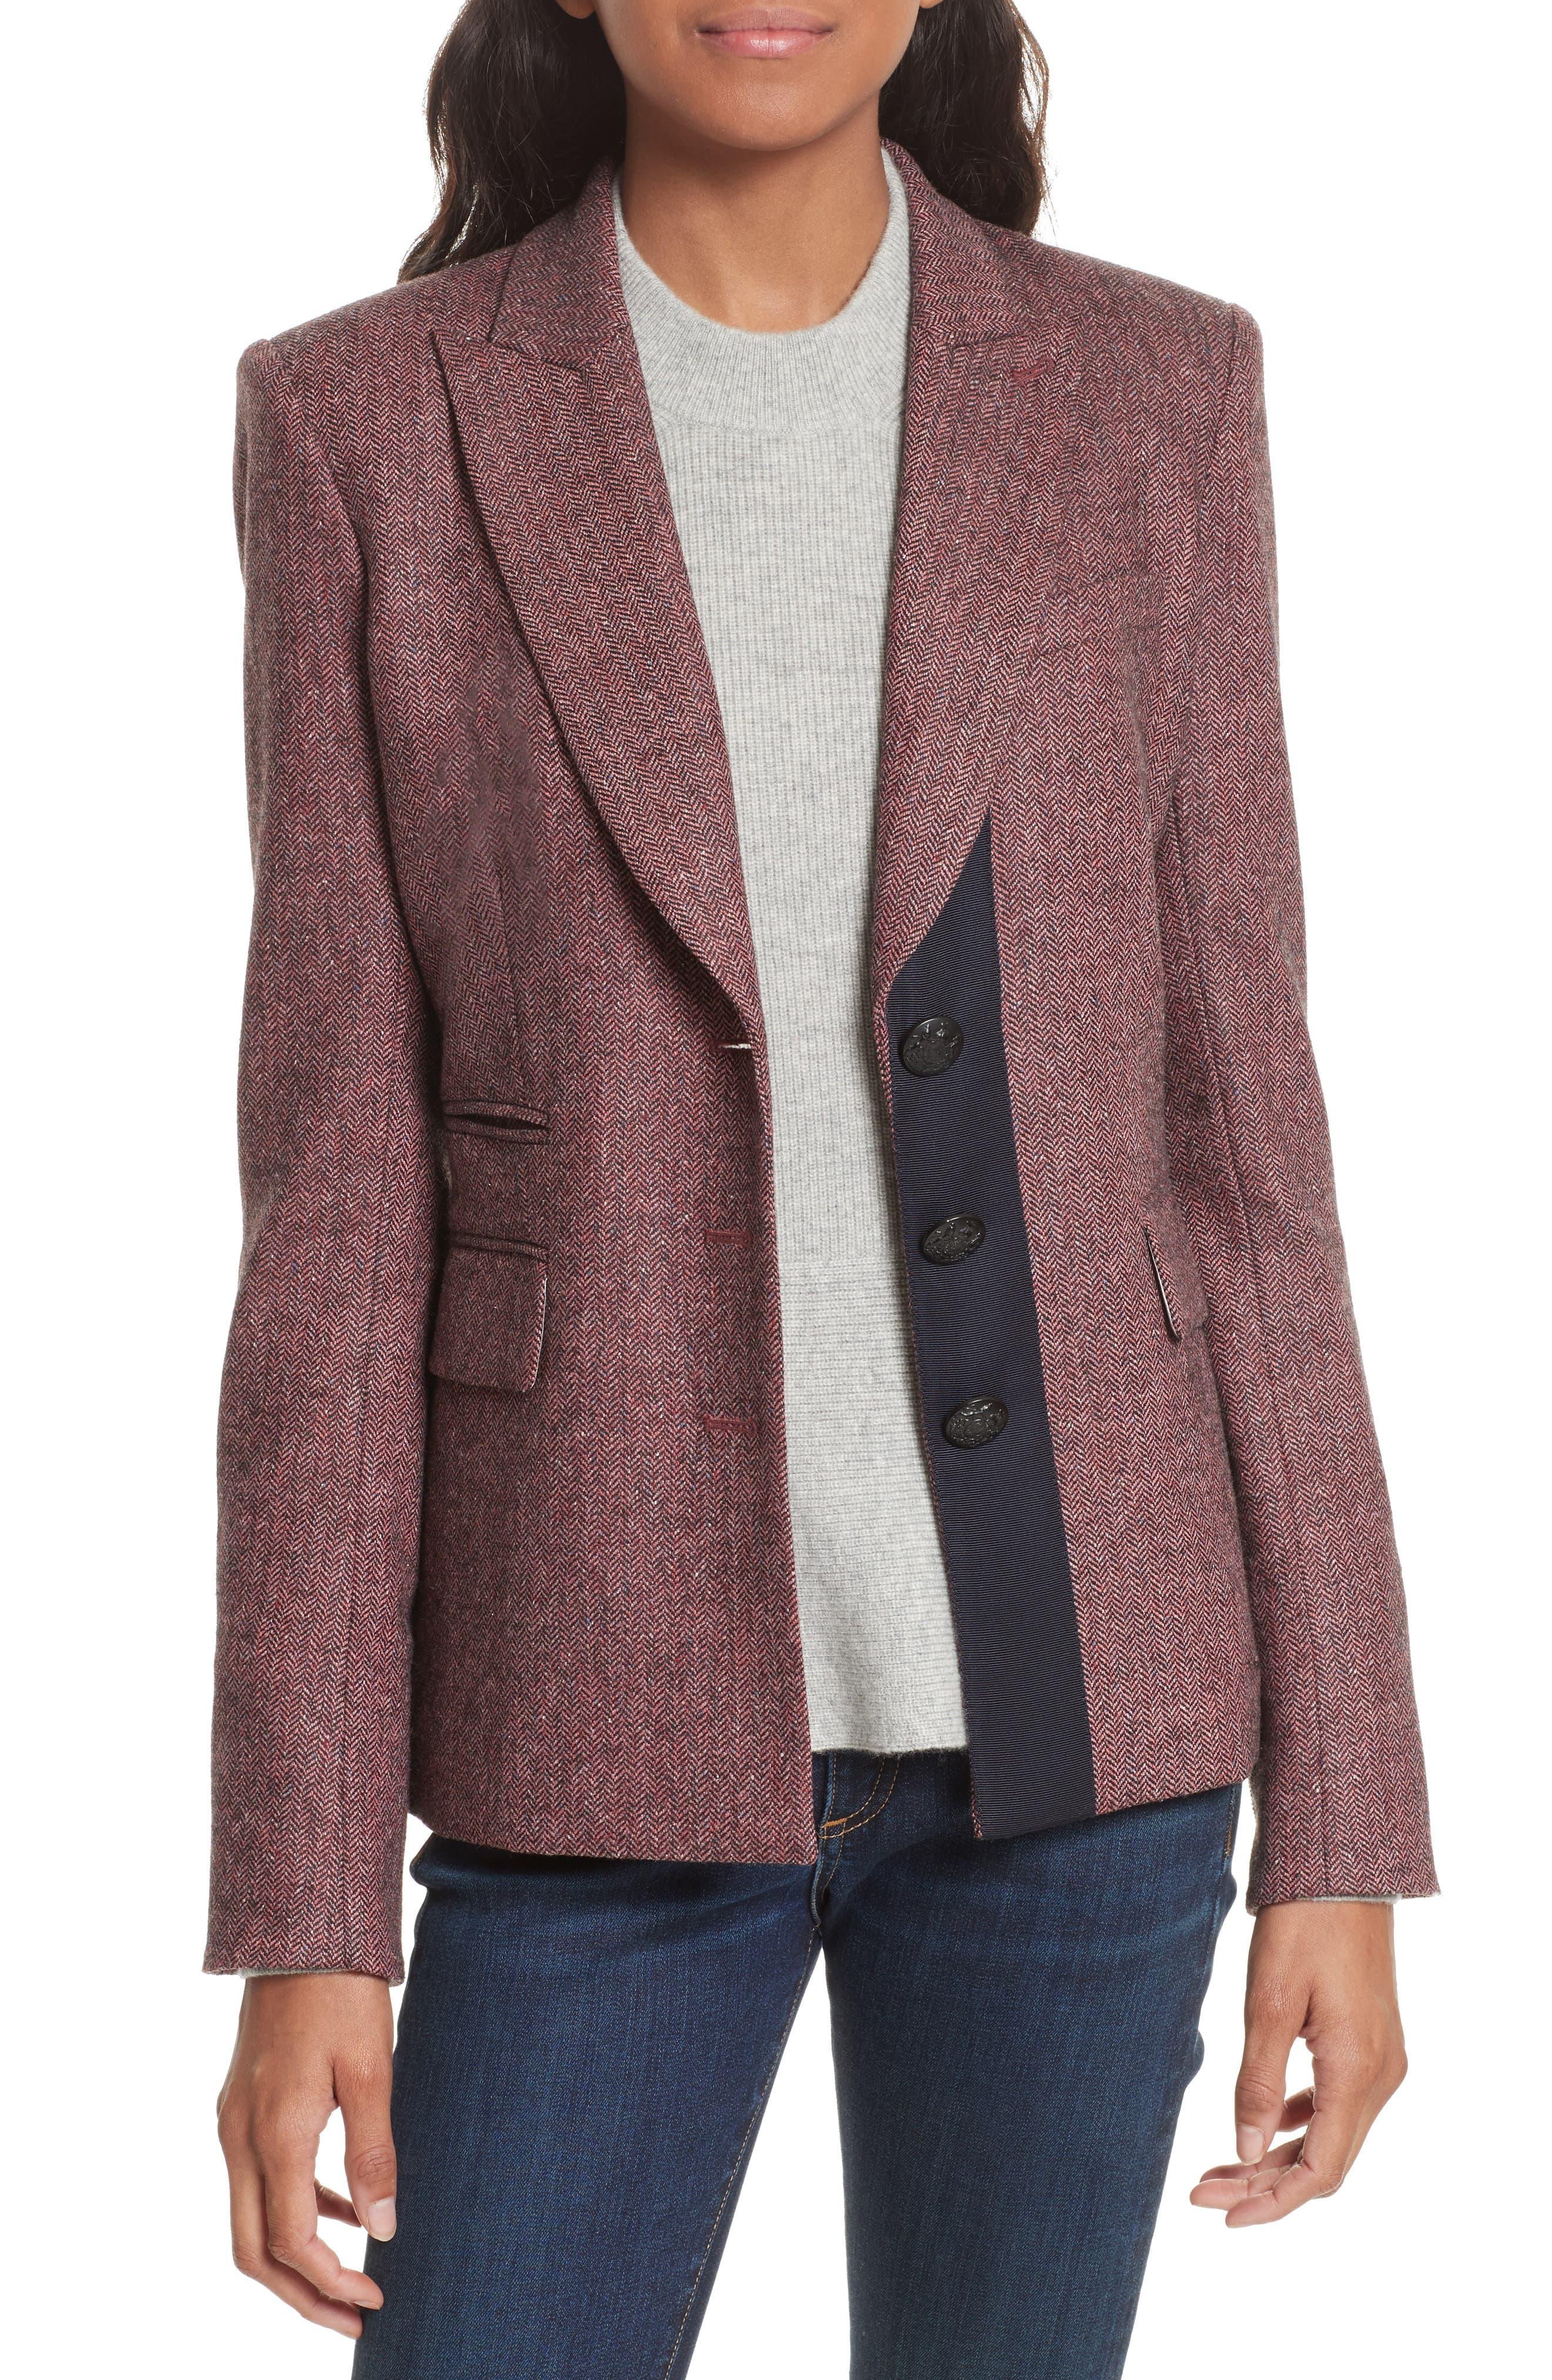 Sterling Grosgrain Trim Jacket,                             Main thumbnail 1, color,                             Rose